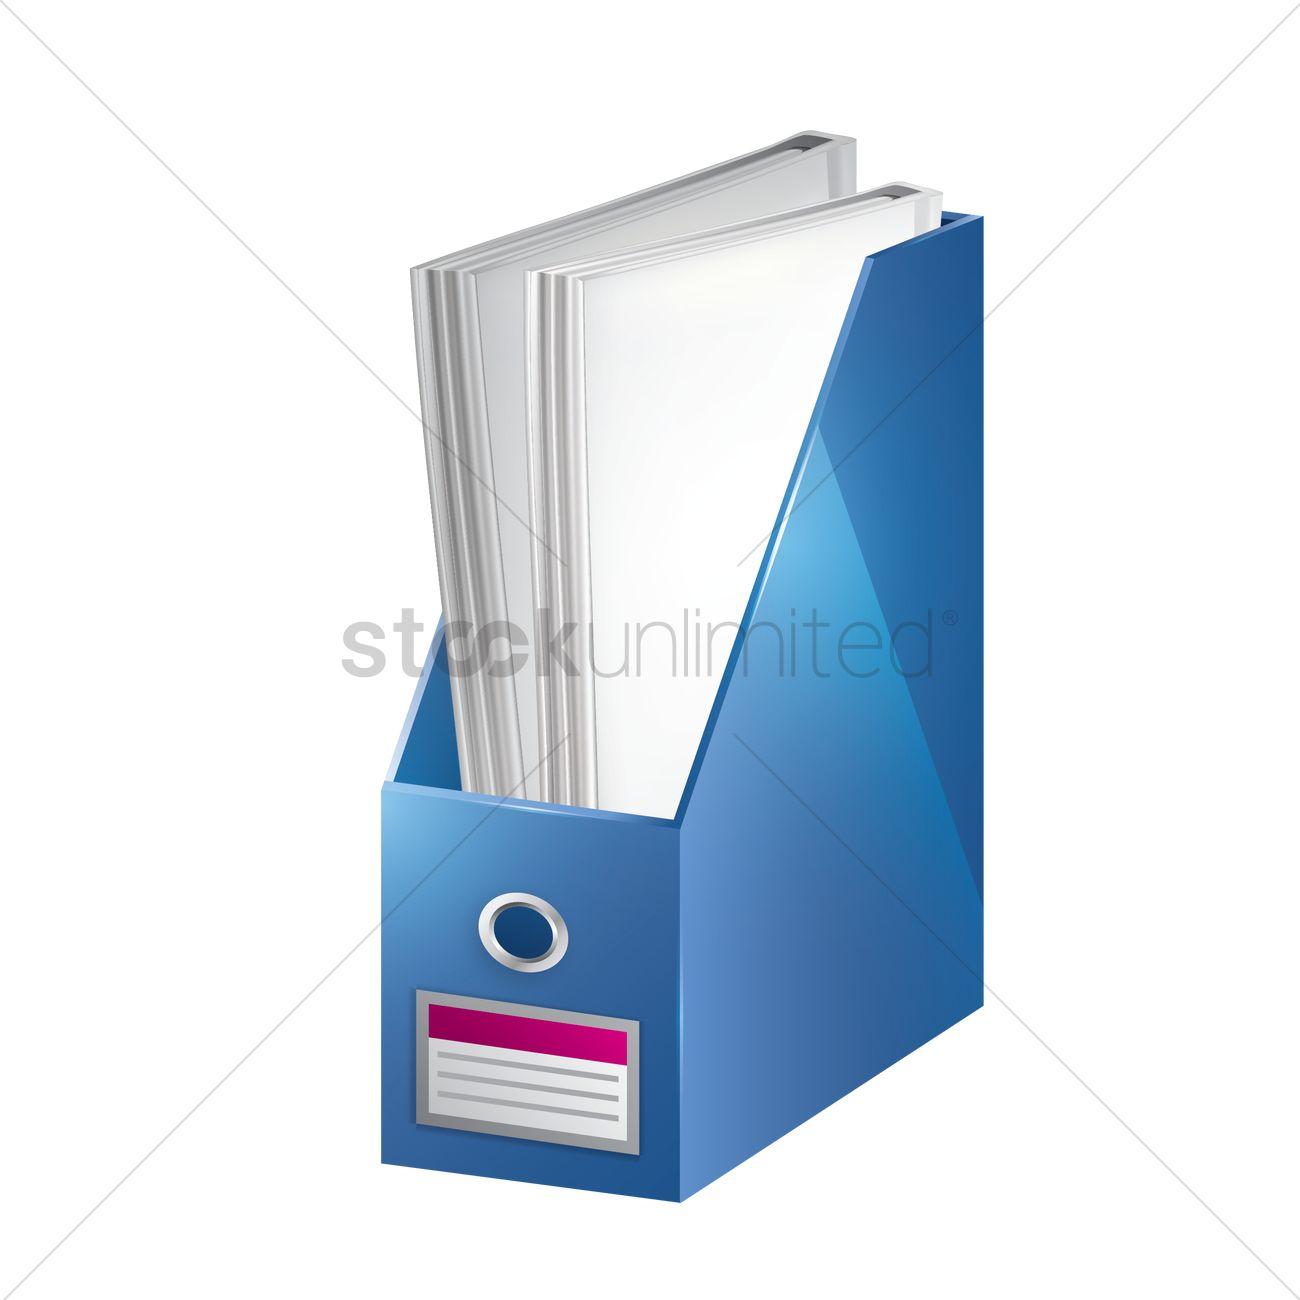 1300x1300 File Folder Vector Image